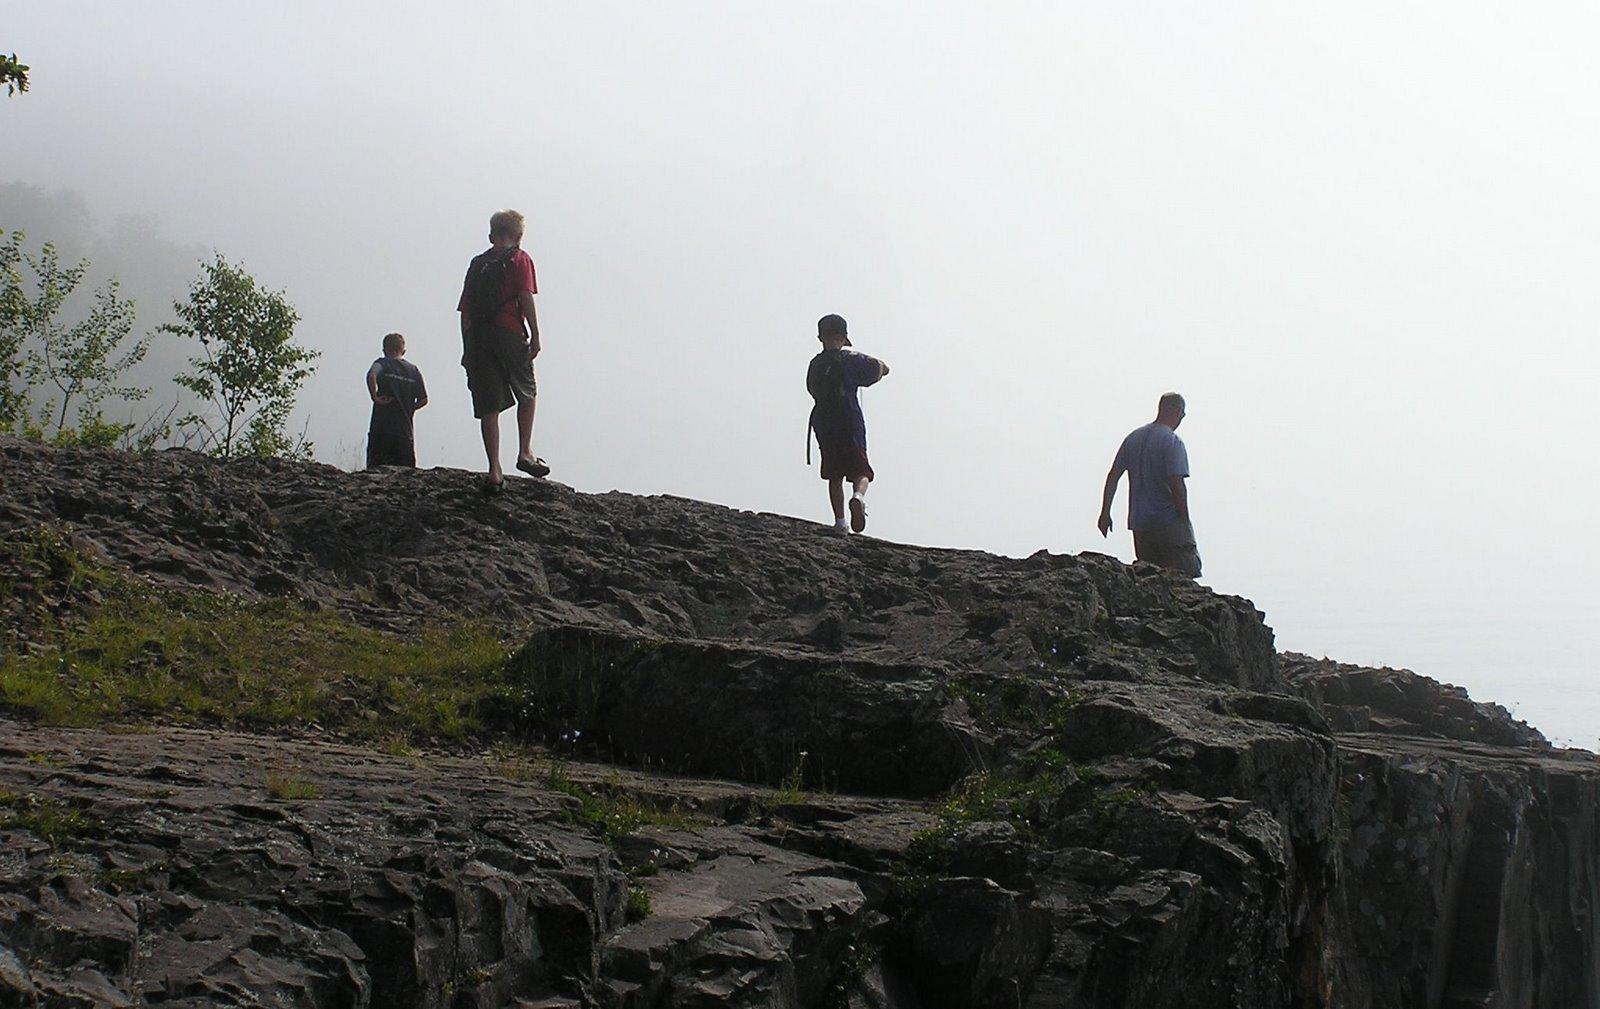 hiking north shore of lake superior at split rock